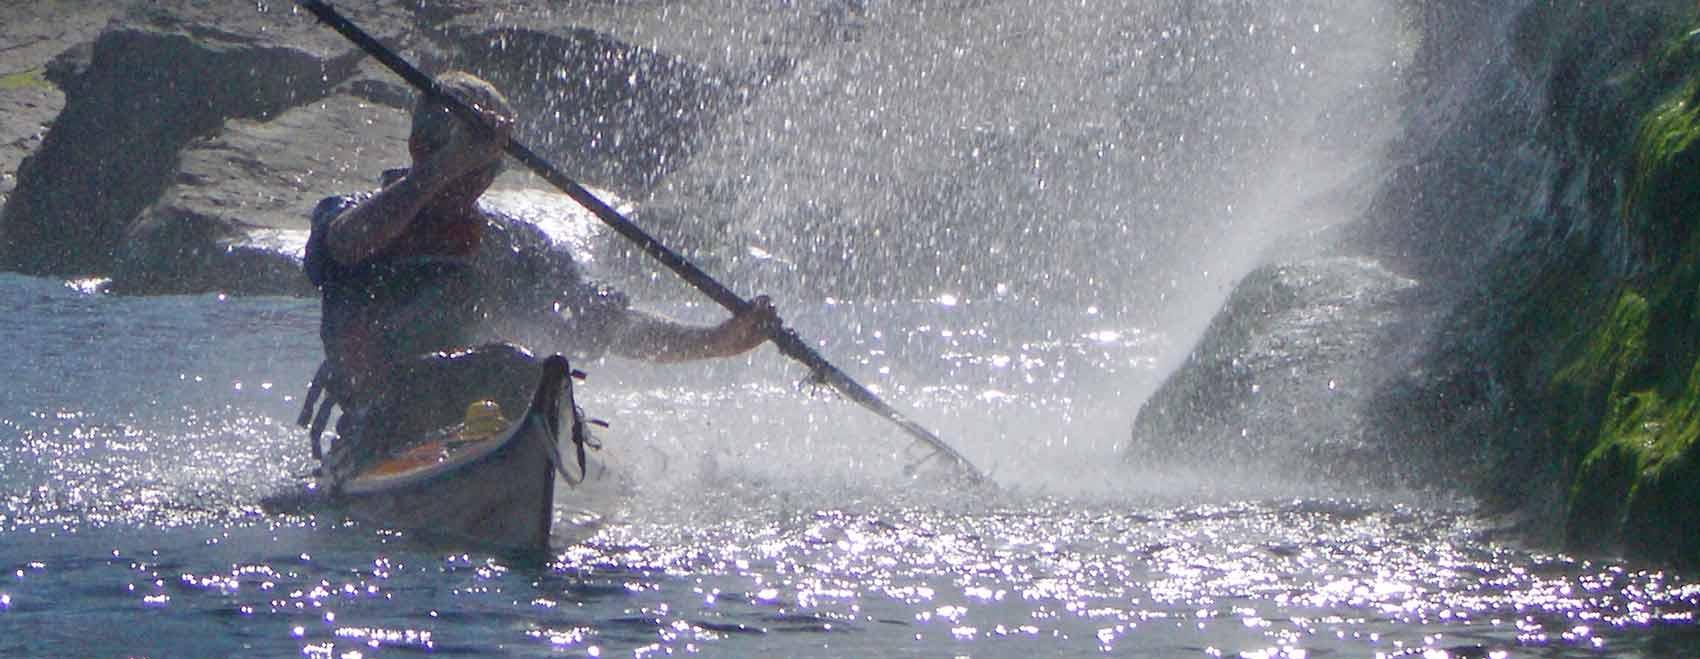 Karitek for the revolutionary Flat Earth sea kayak sails